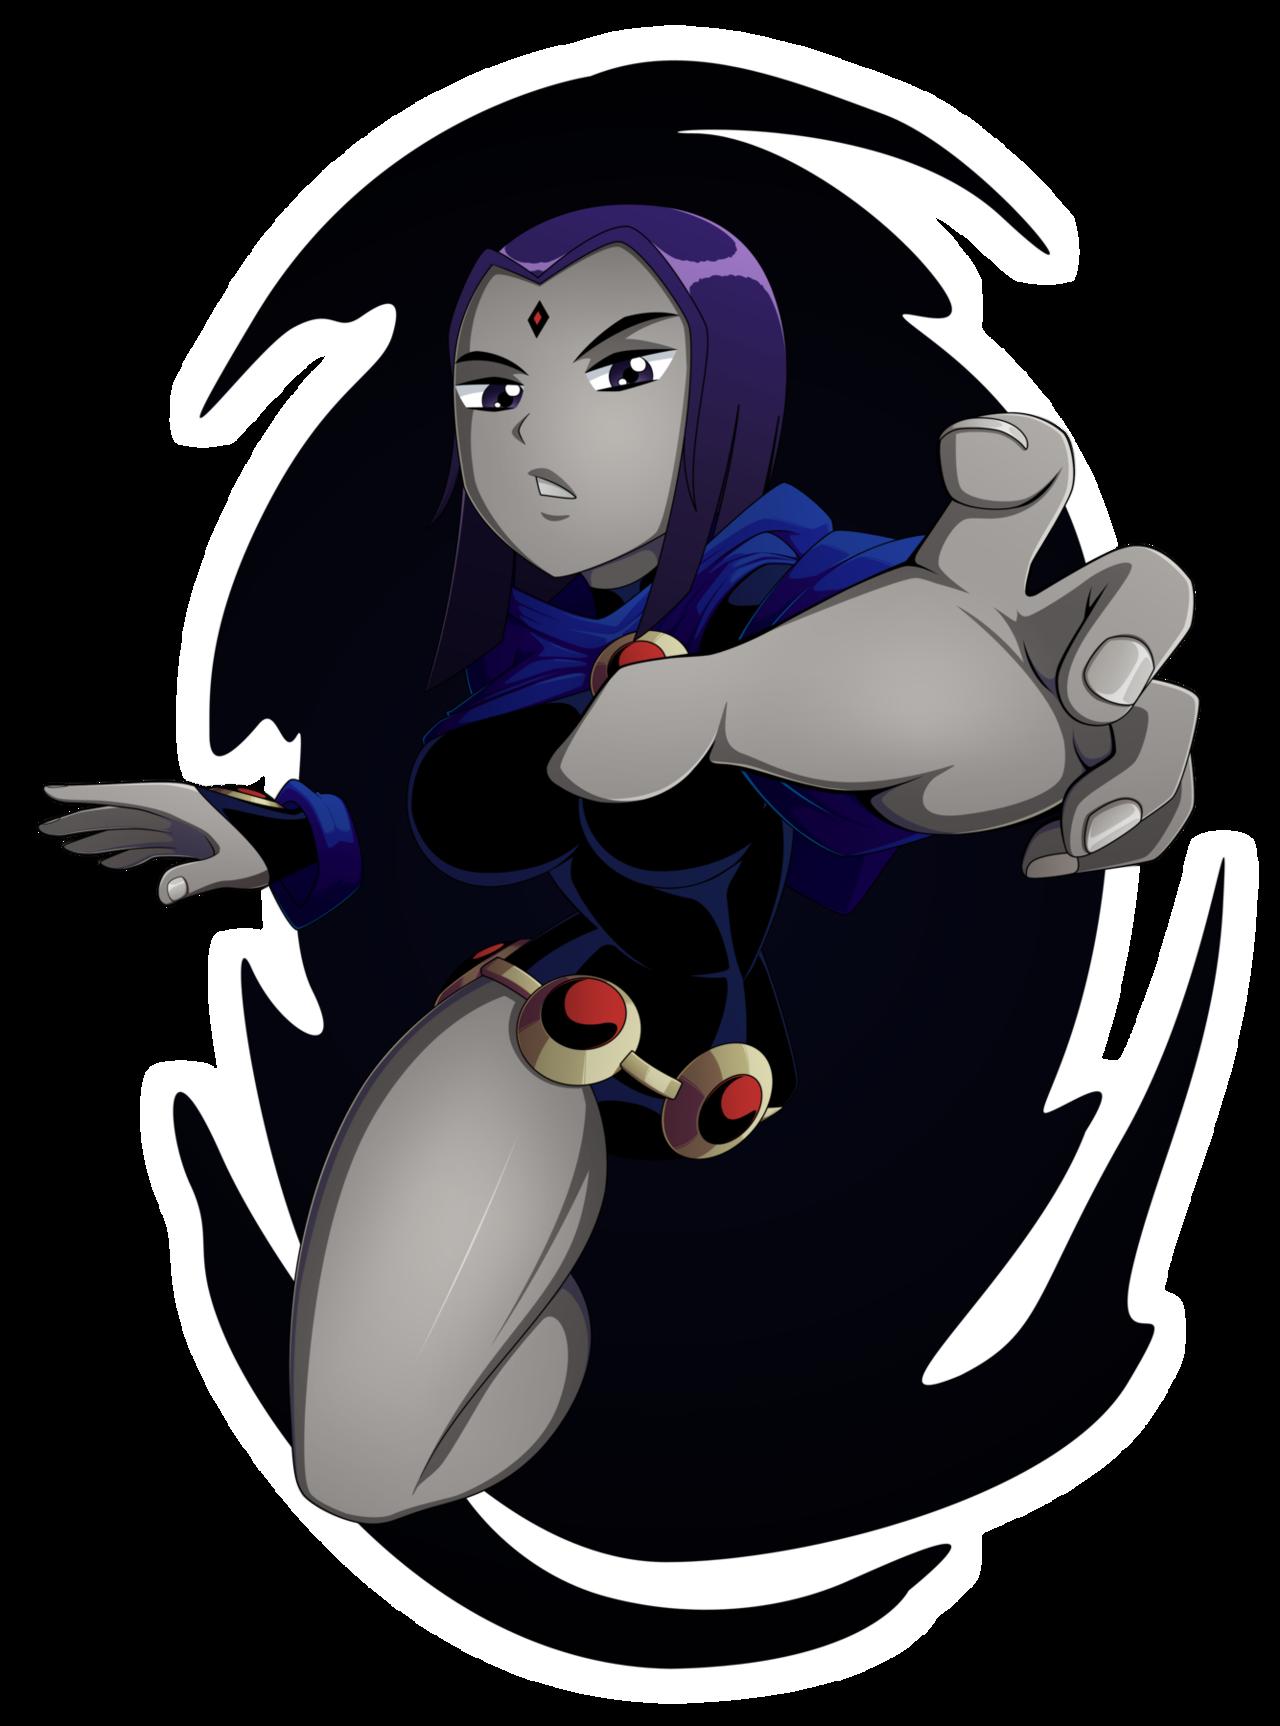 #SixFanarts - Raven by ShonGreen on Newgrounds